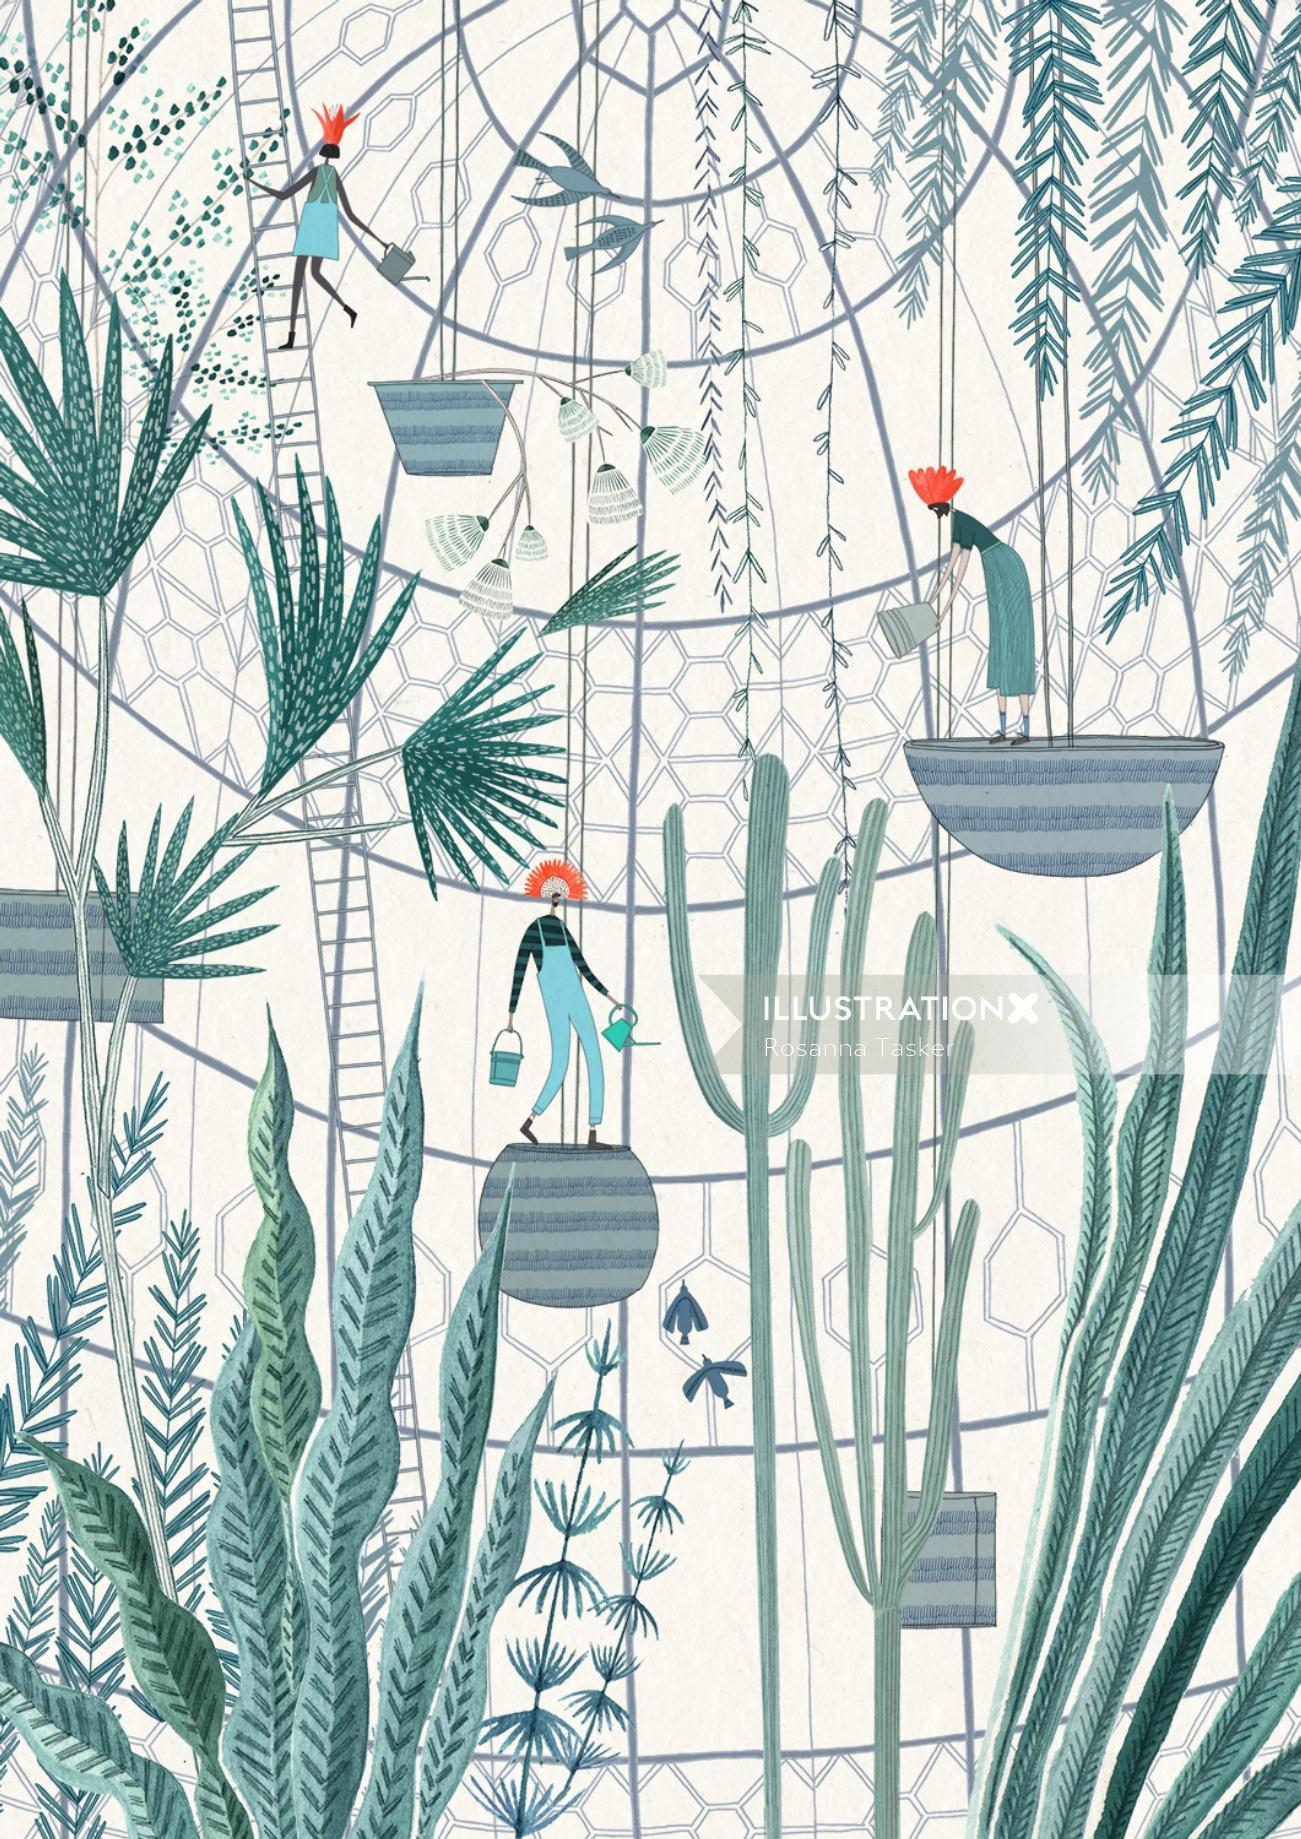 greenhouse, grow, growing, gardening, gardener, community